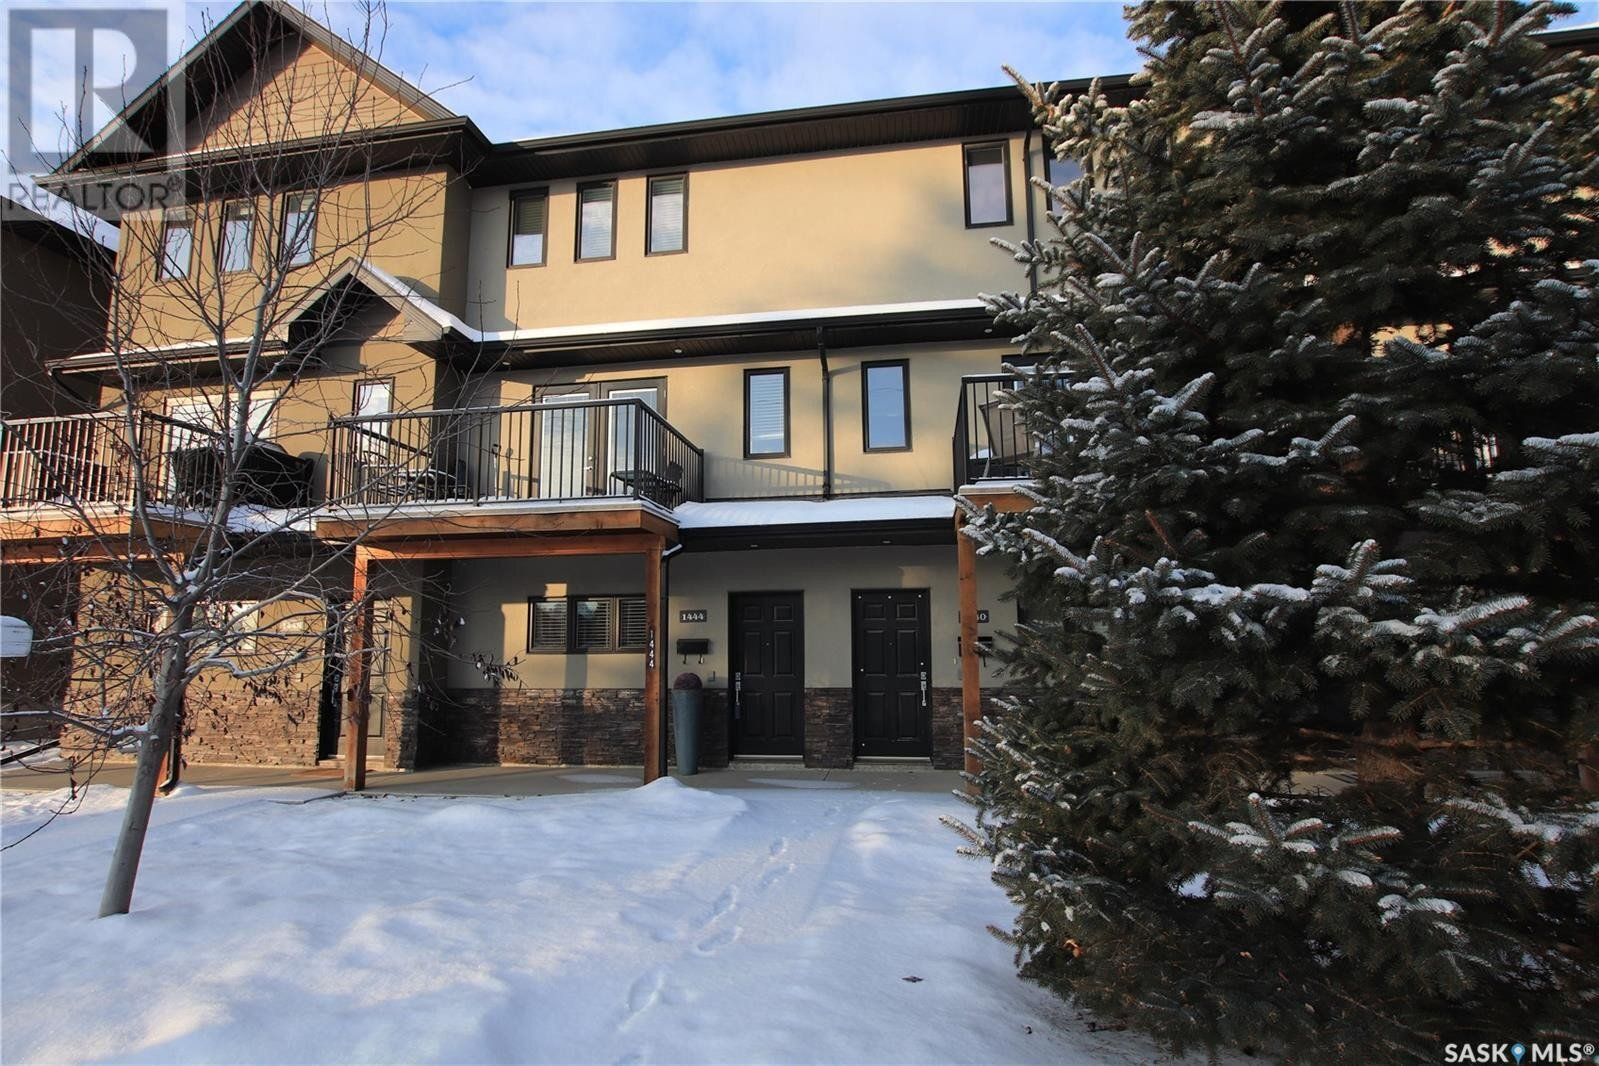 Townhouse for sale at 1444 Mccarthy Blvd Regina Saskatchewan - MLS: SK820881